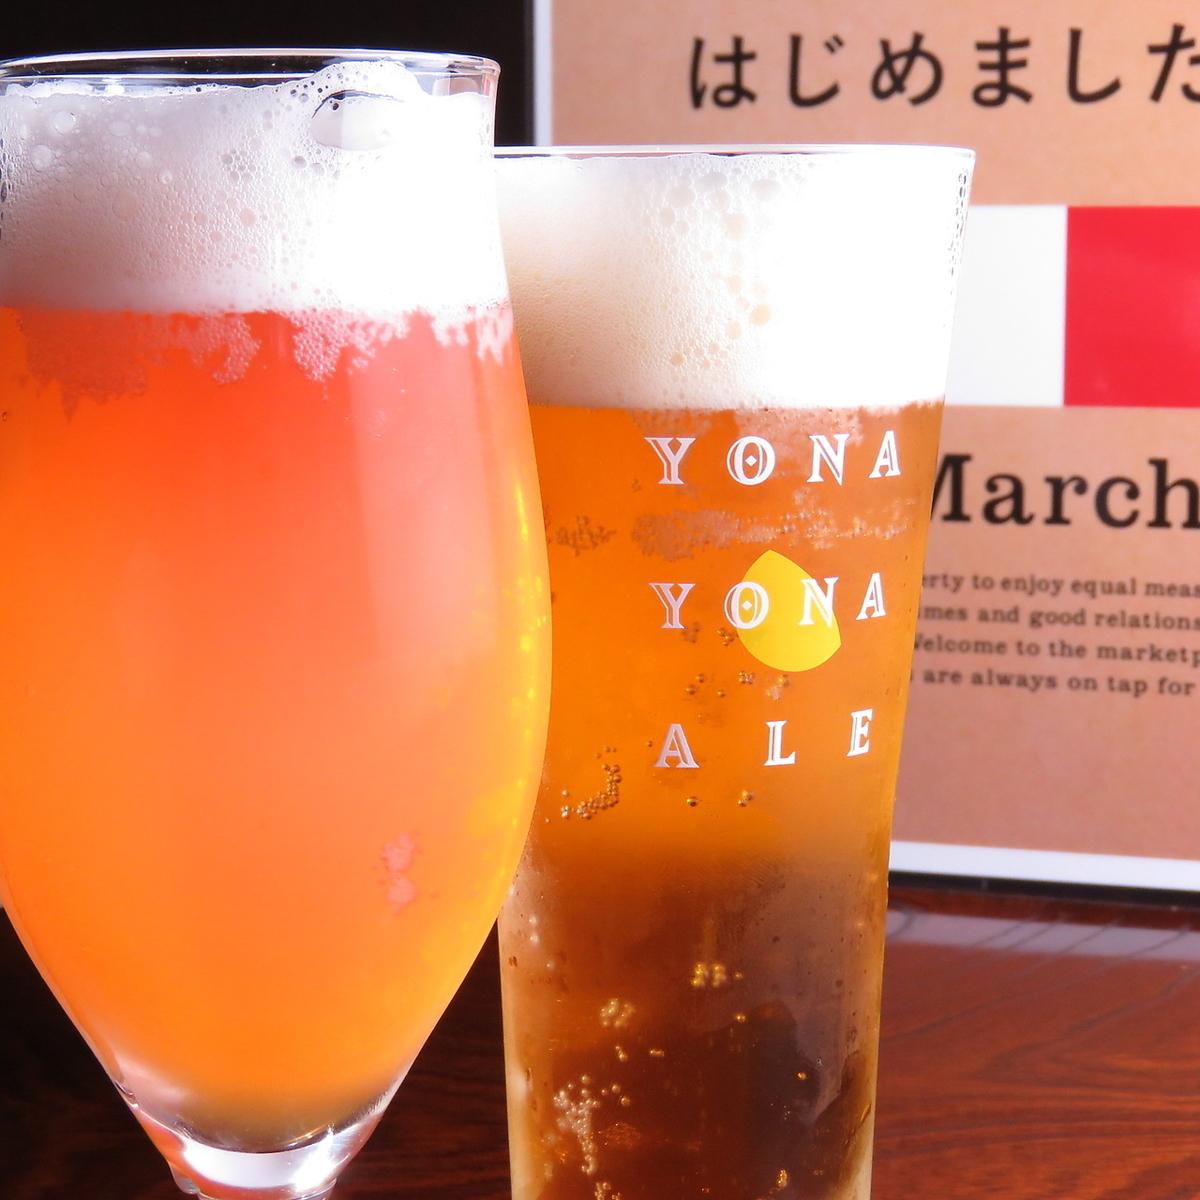 Four kinds of craft beer ♪ R 500 yen / L 800 yen